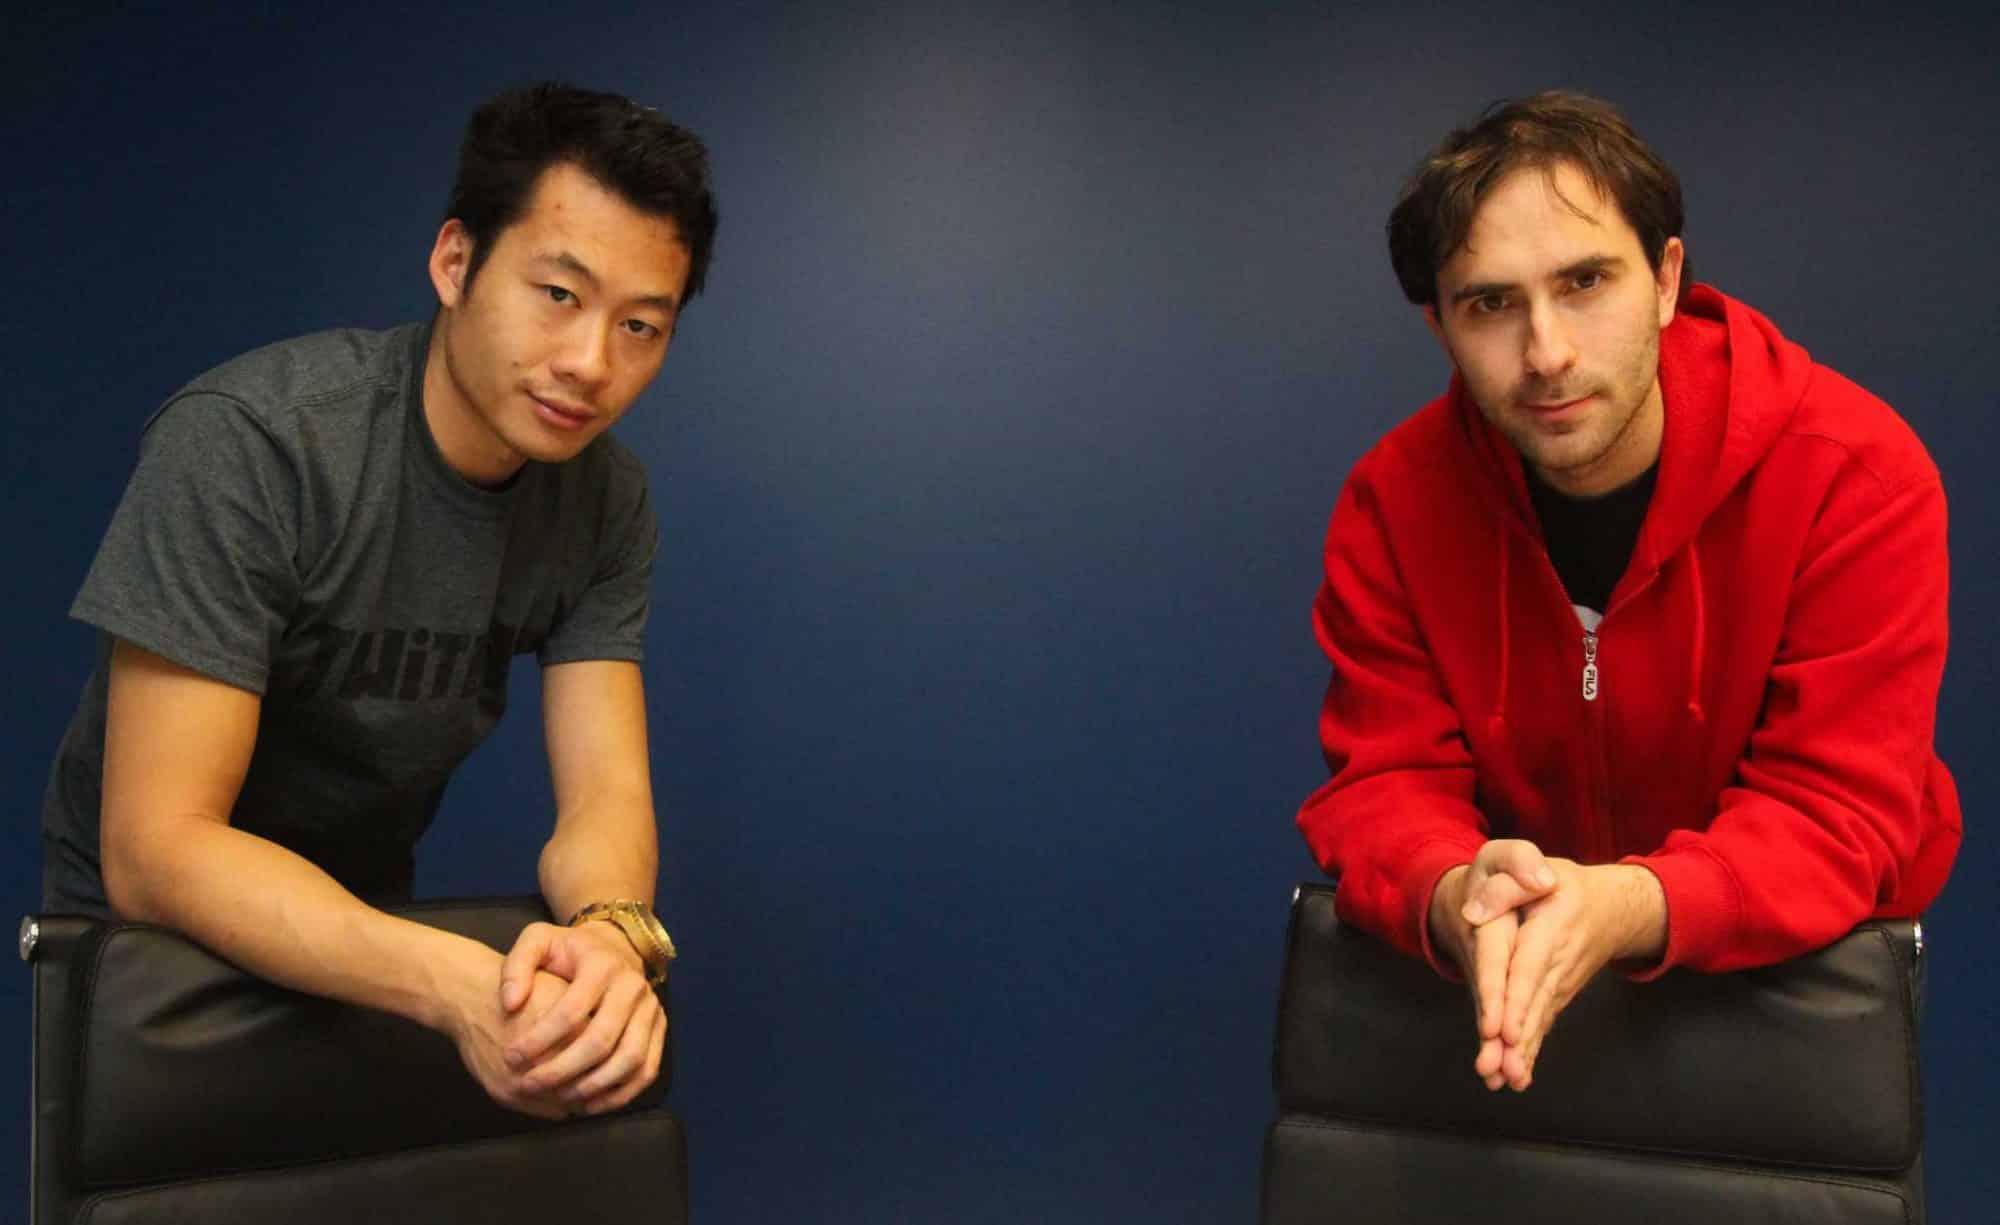 Justin Kan et Emmett Shear, fondateurs de Twitch